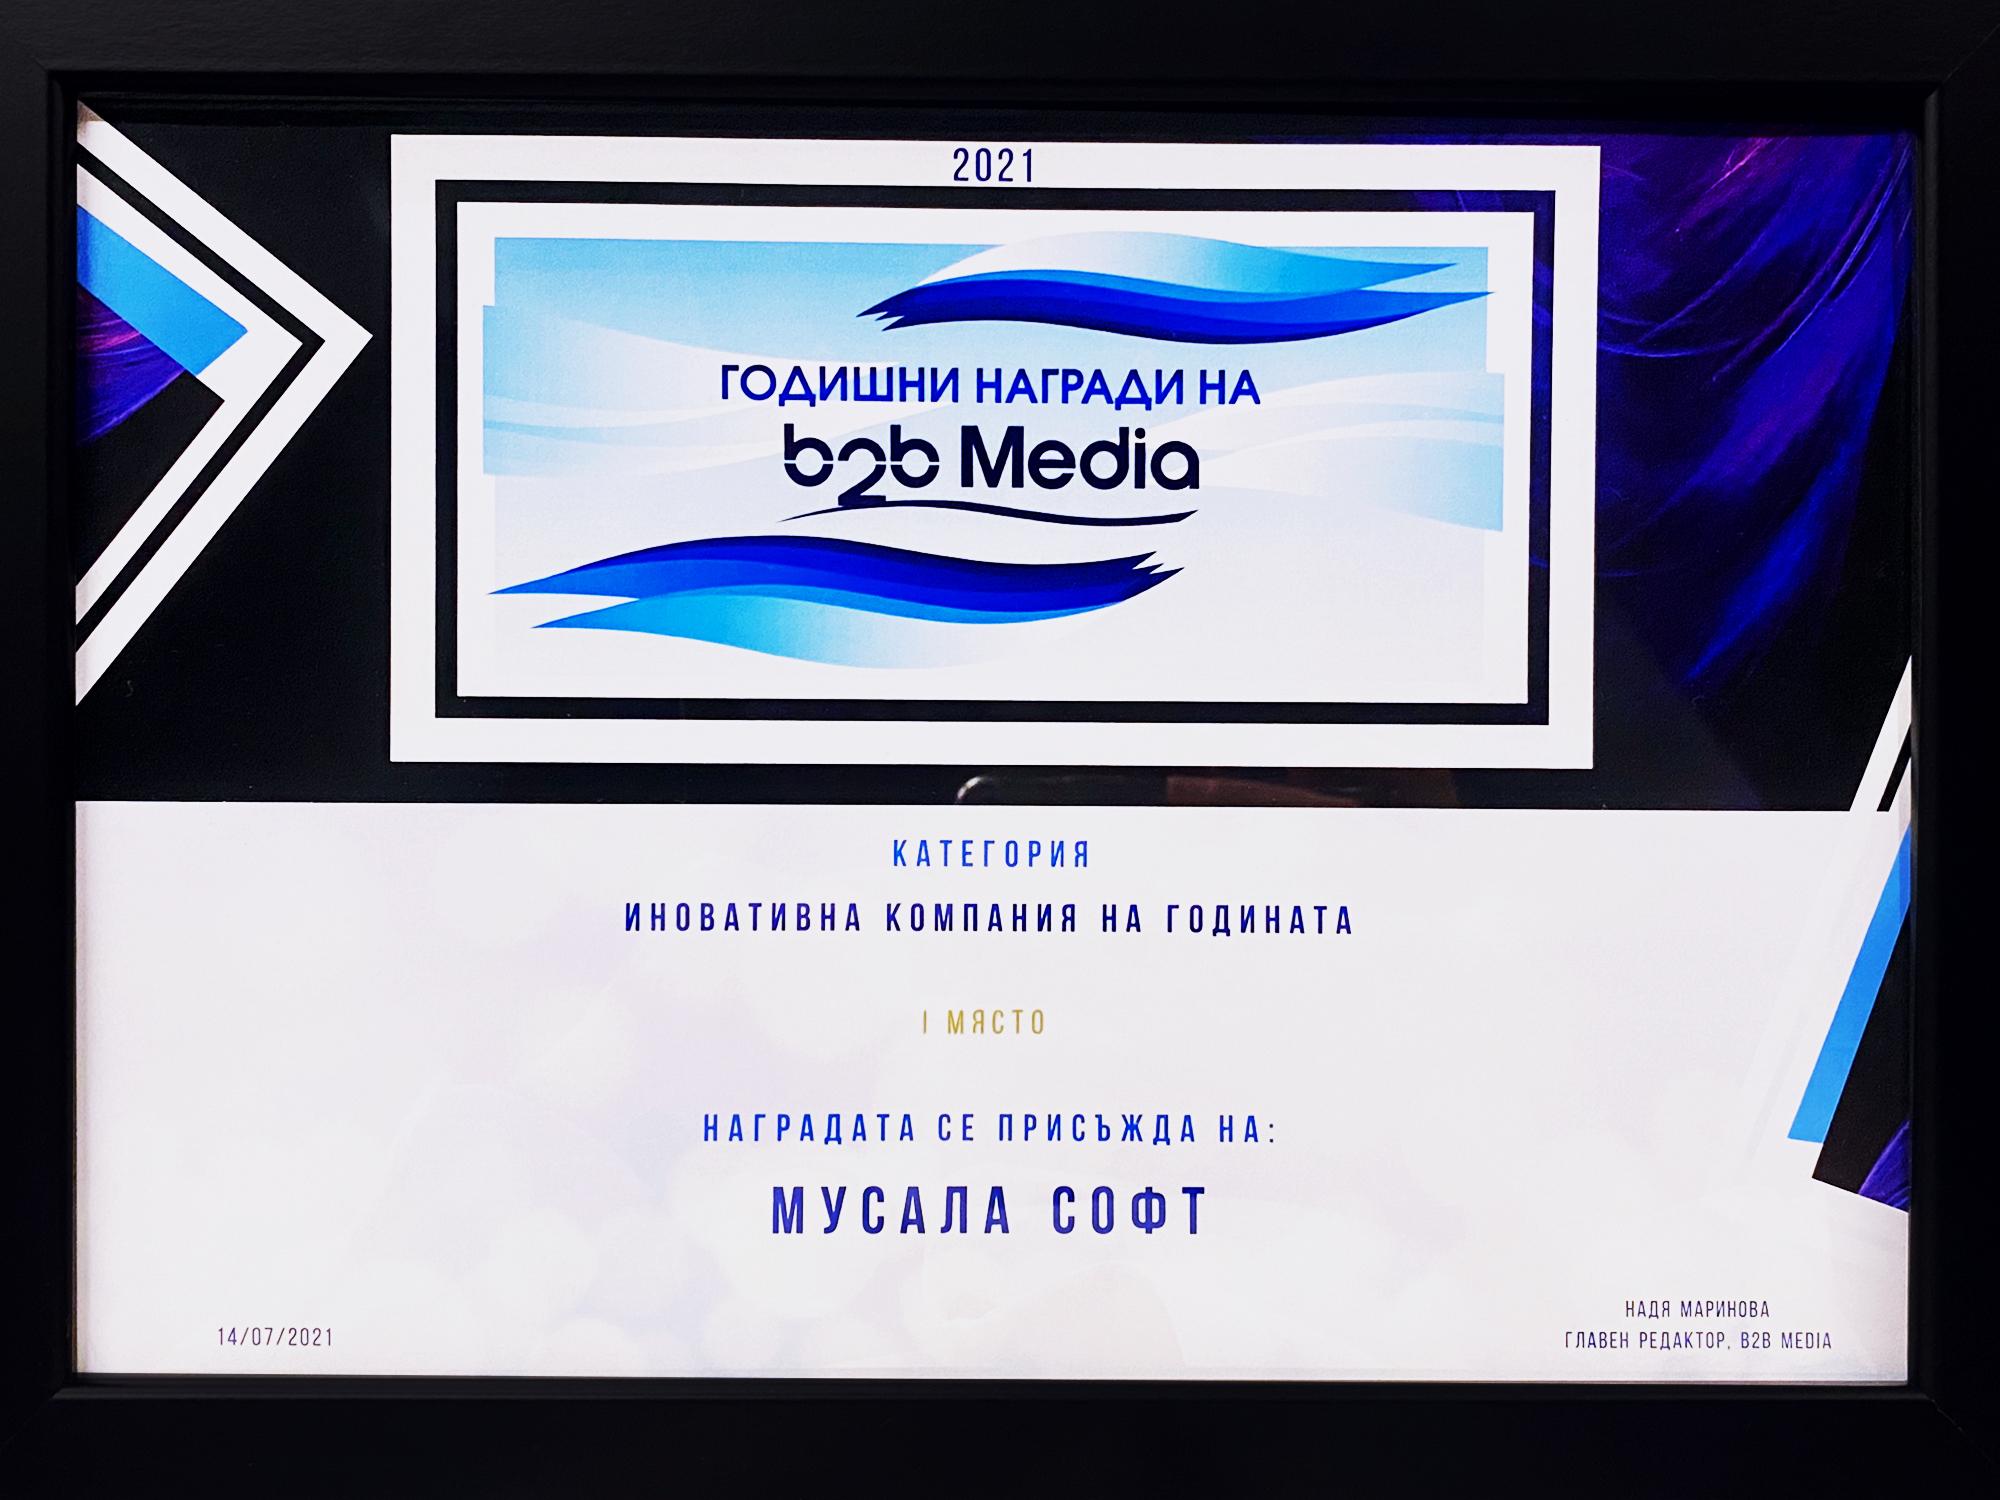 Musala Soft – Innovative Company of the Year at the b2b Media Awards 2021